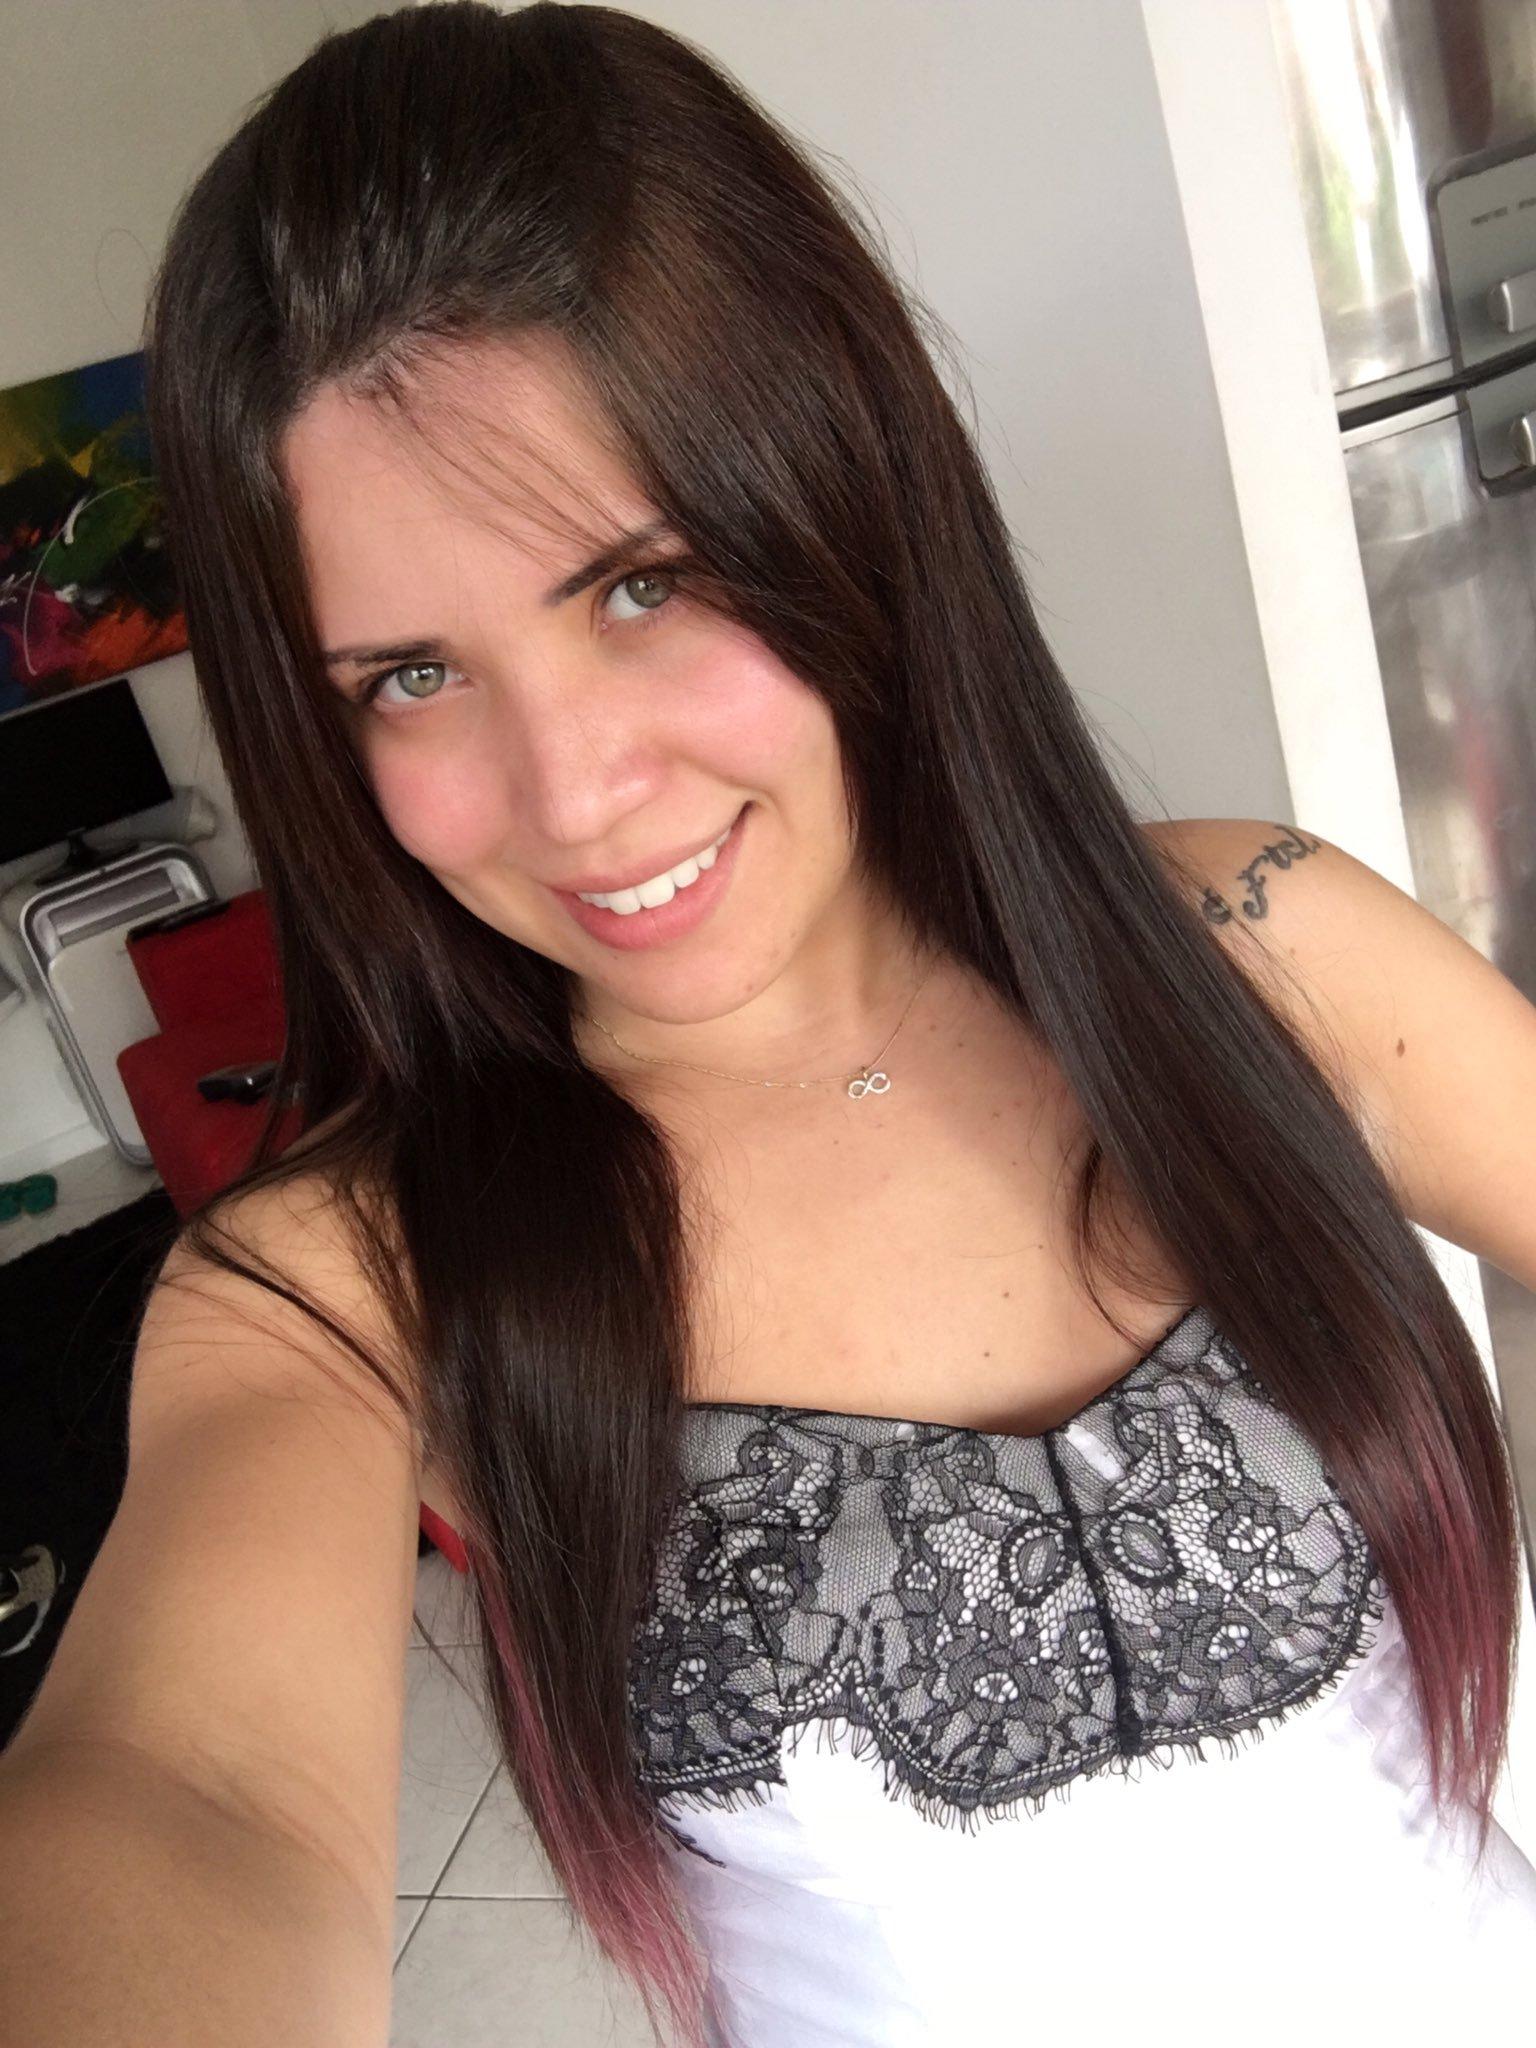 Fotos amadoras de Yasmin ninfeta garota de programa